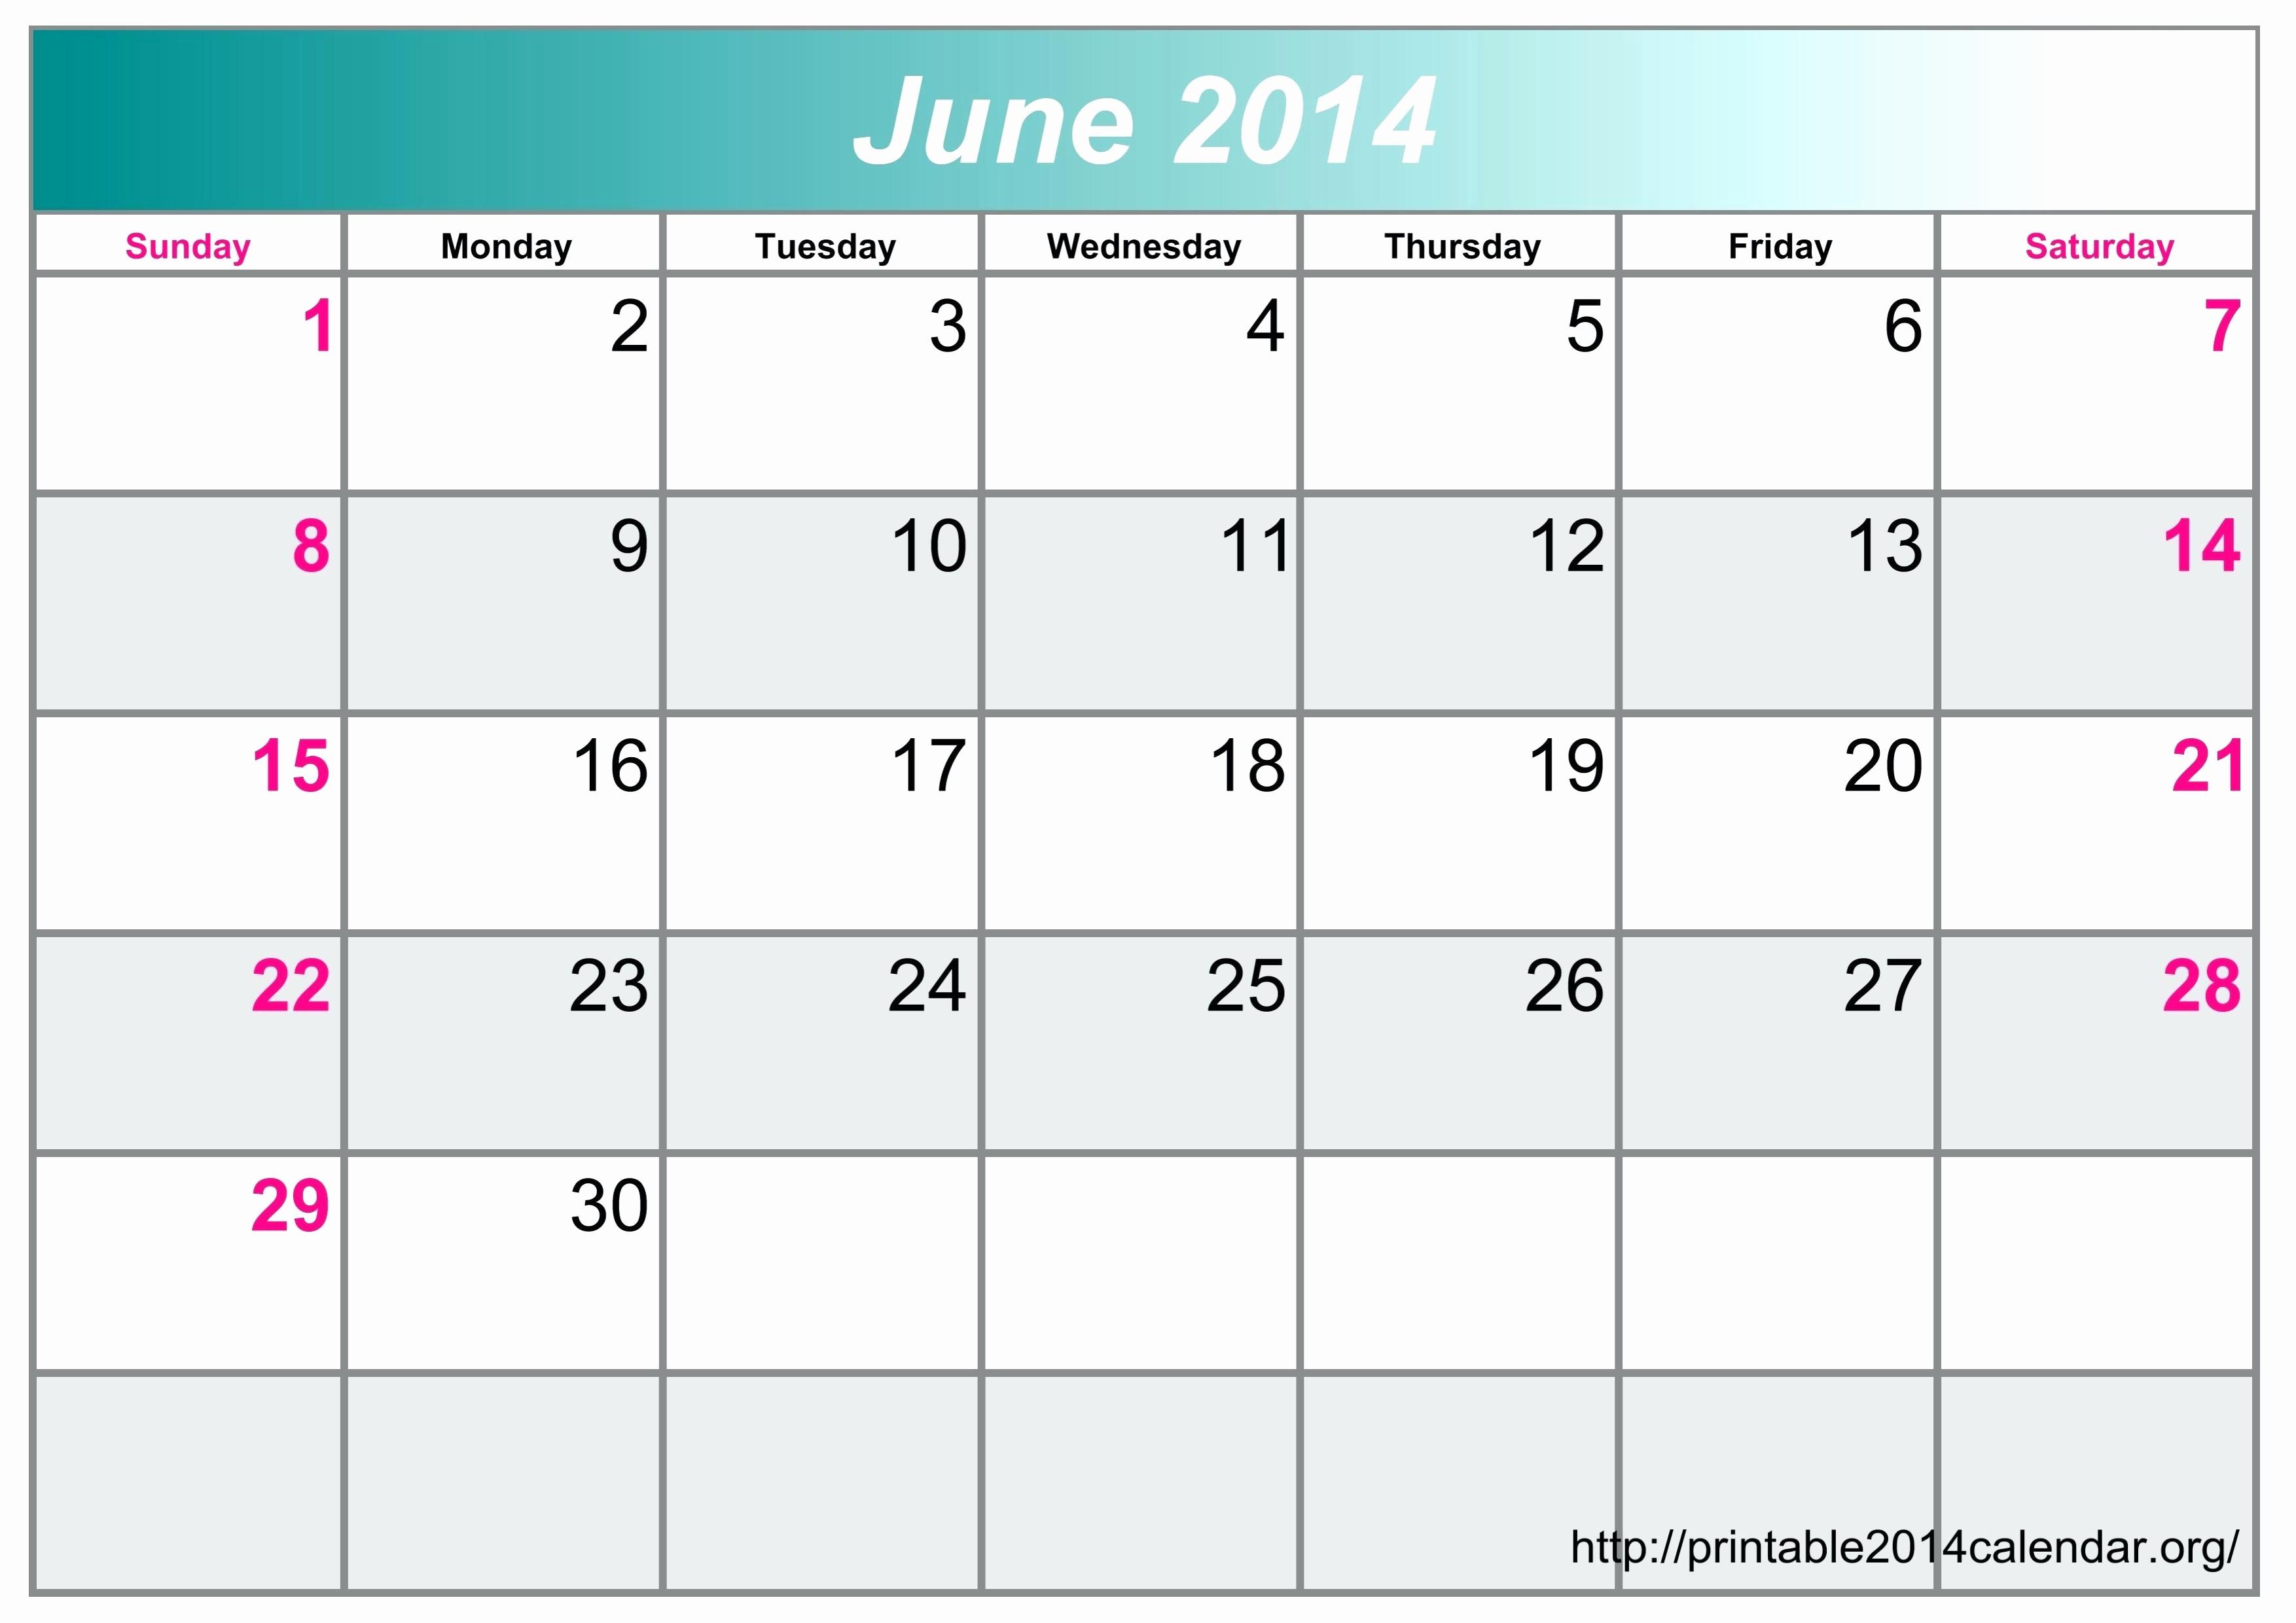 Calendar Template for June 2015 Fresh Template June Calendar Template Printable 2015 Landscape